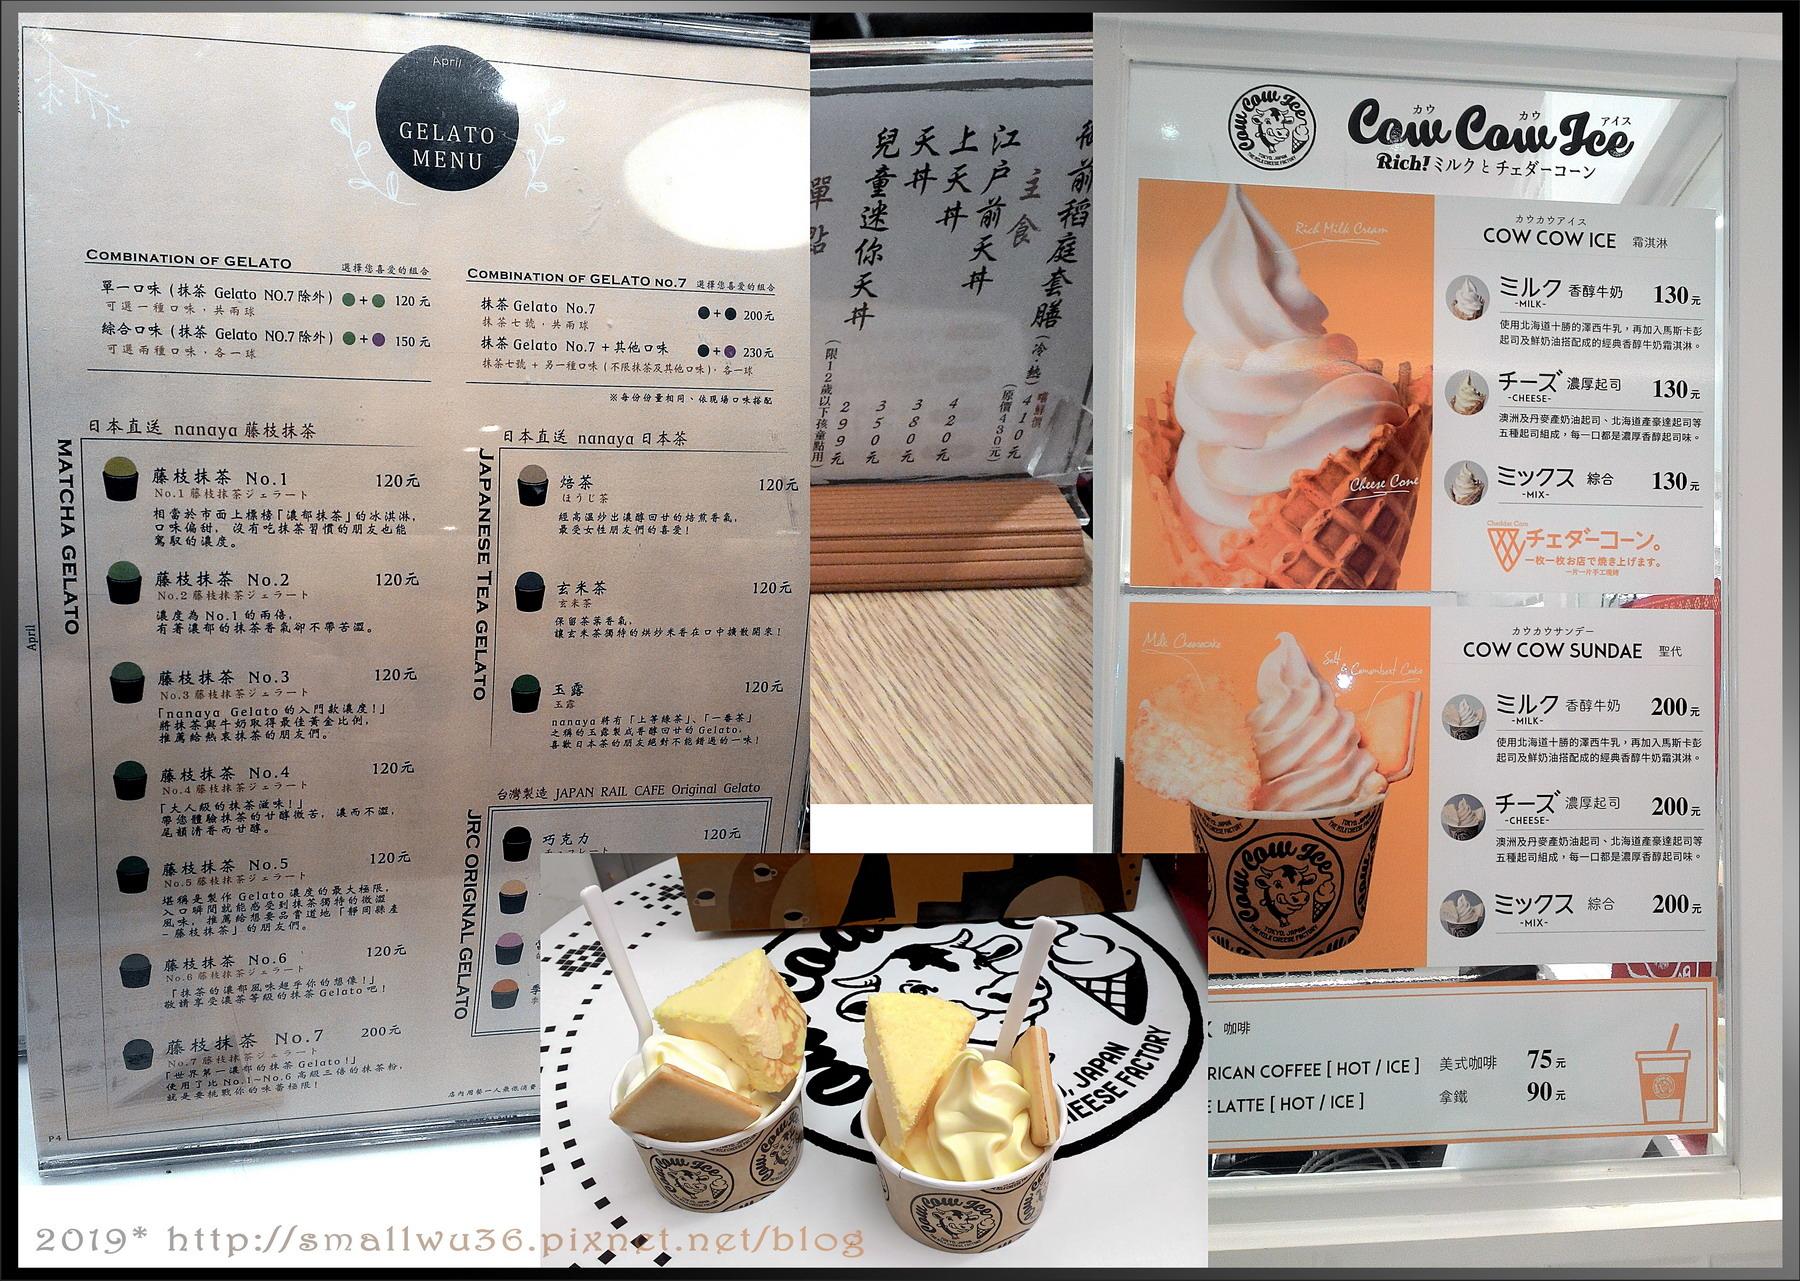 [GELATO] 抹茶焙茶冰淇淋,[東京牛奶起司工房] CowCowIce 起司牛奶冰淇淋餅乾蛋糕.jpg